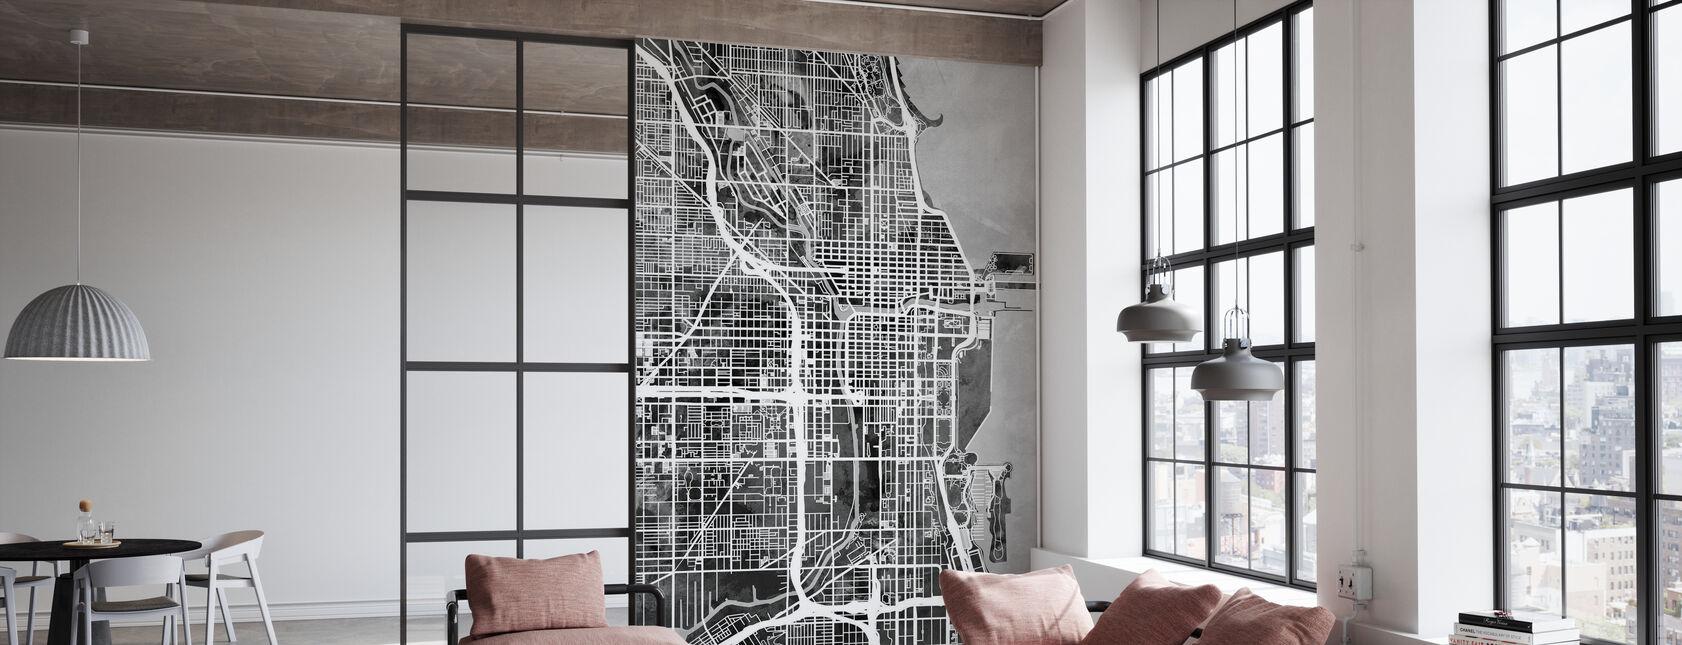 Chicago Street Map B/W - Wallpaper - Office